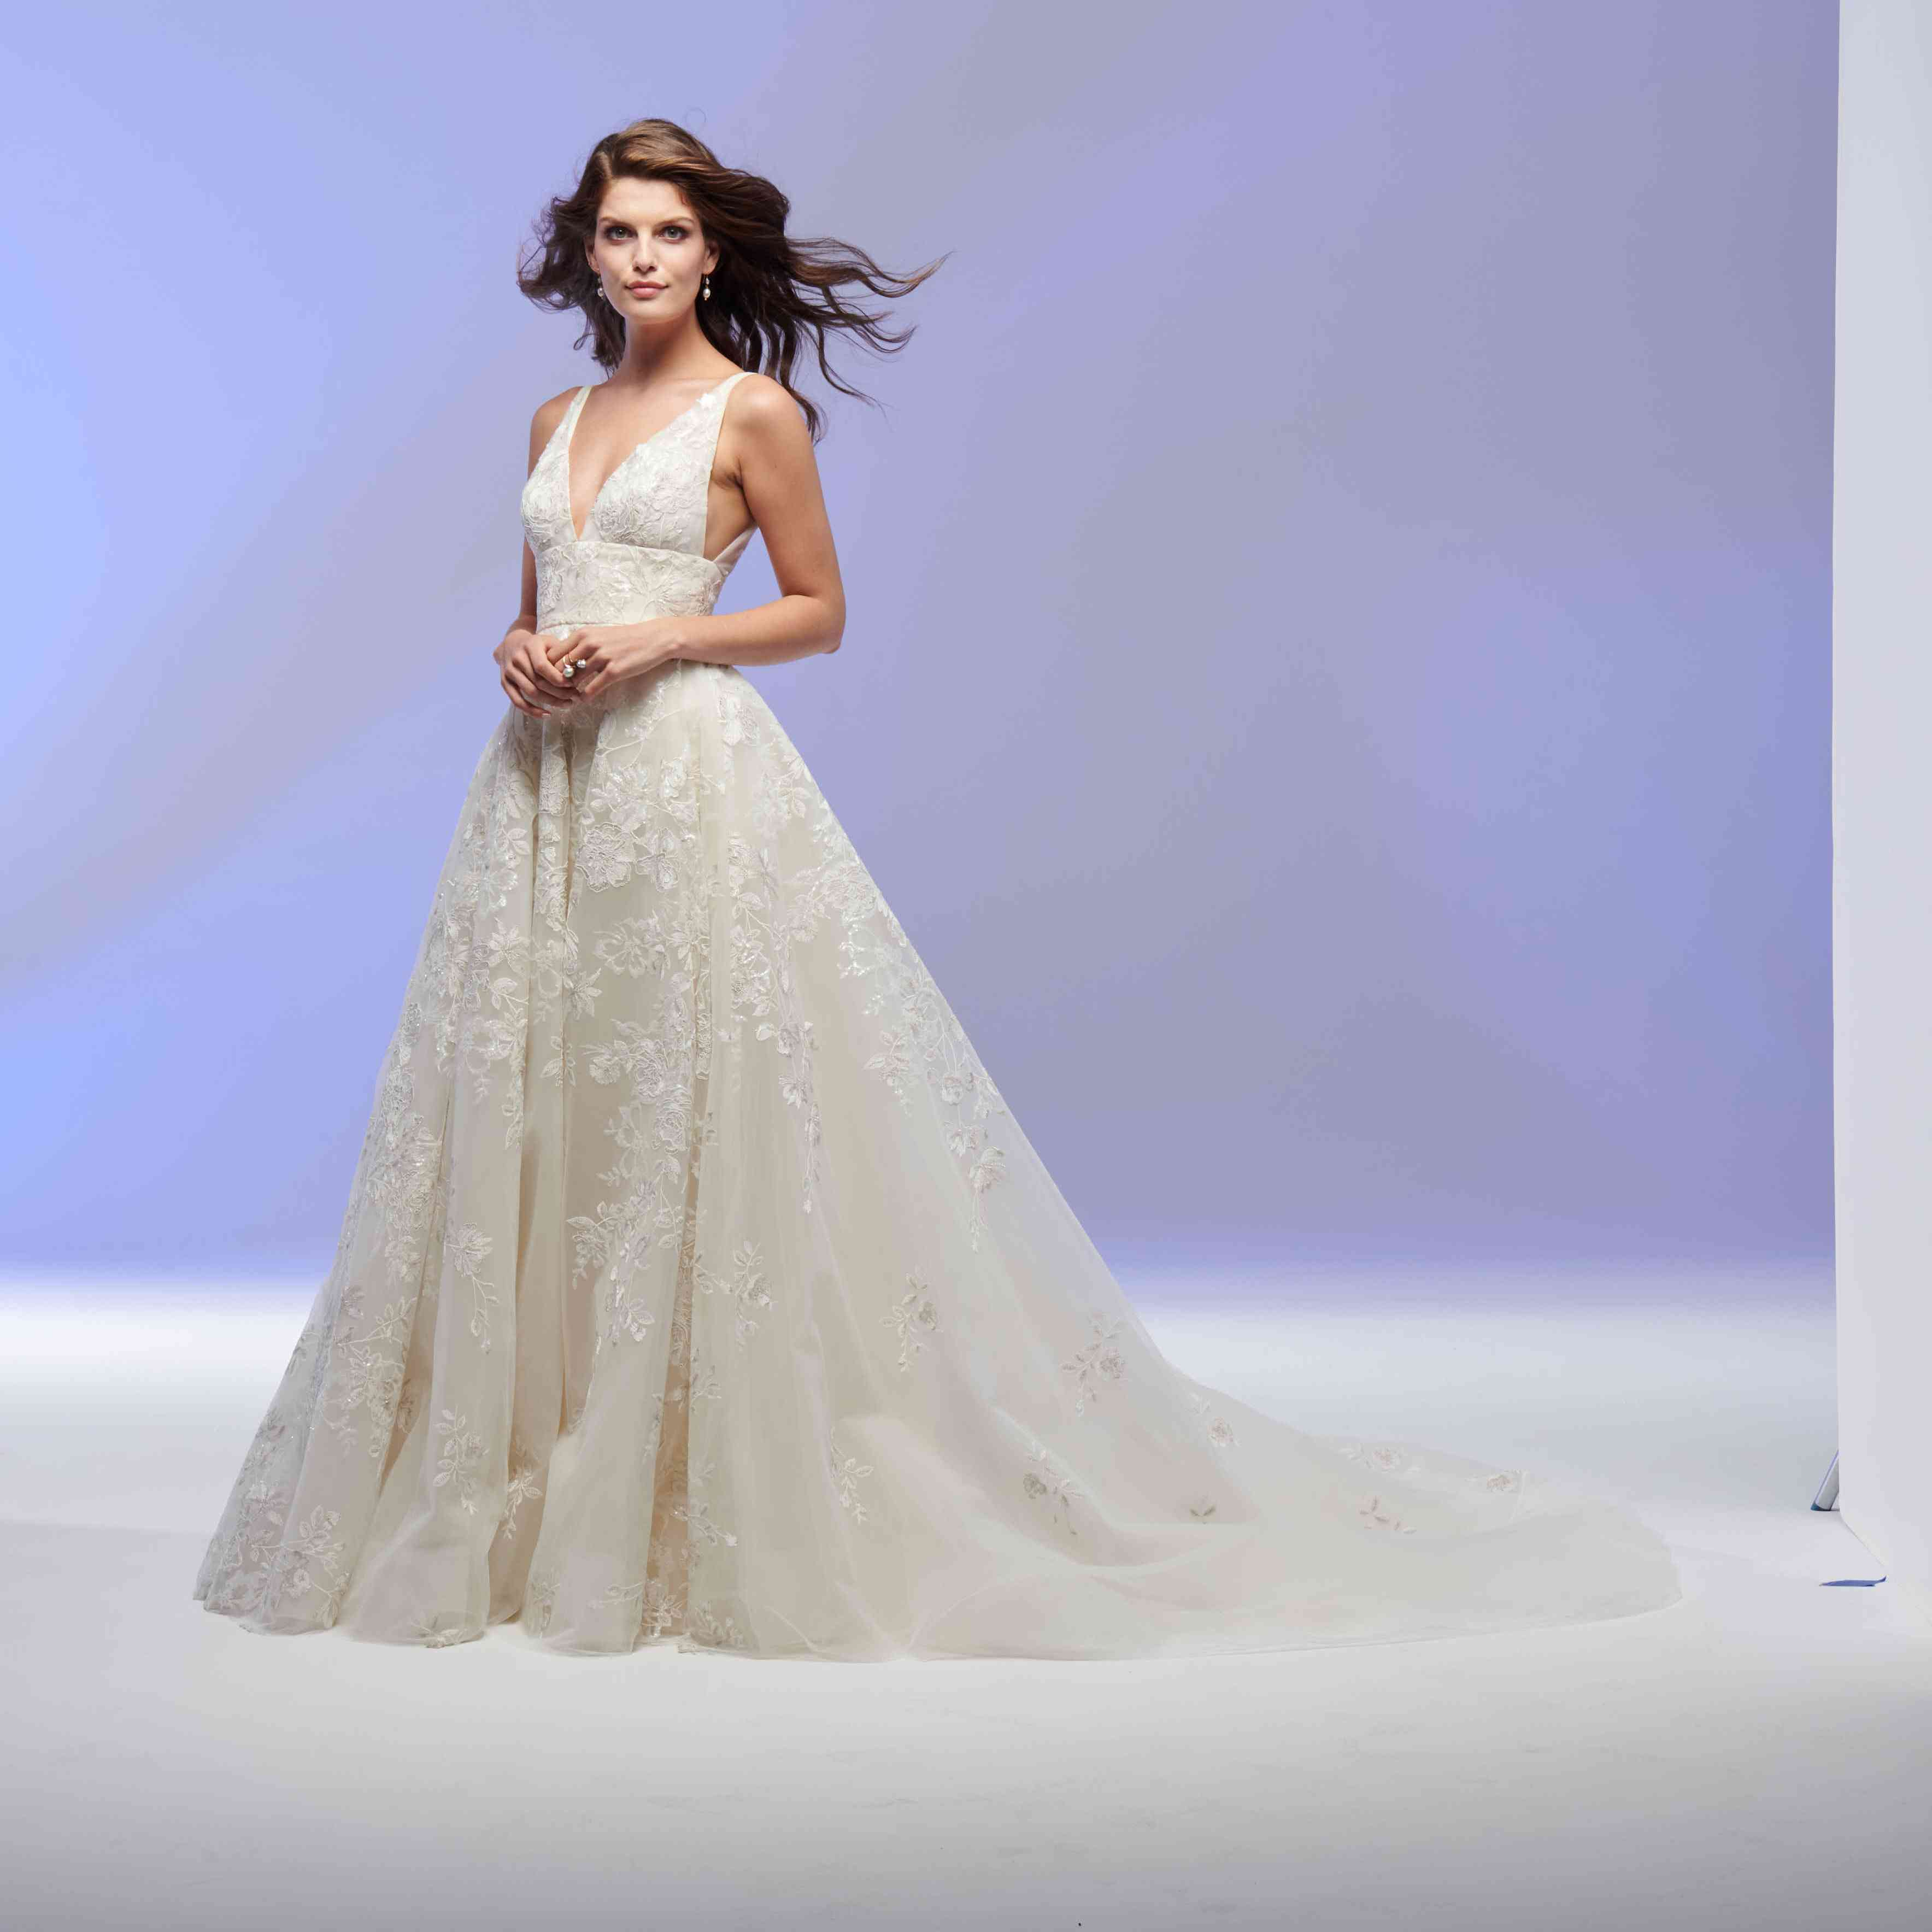 Adelaide sleeveless A-line wedding dress